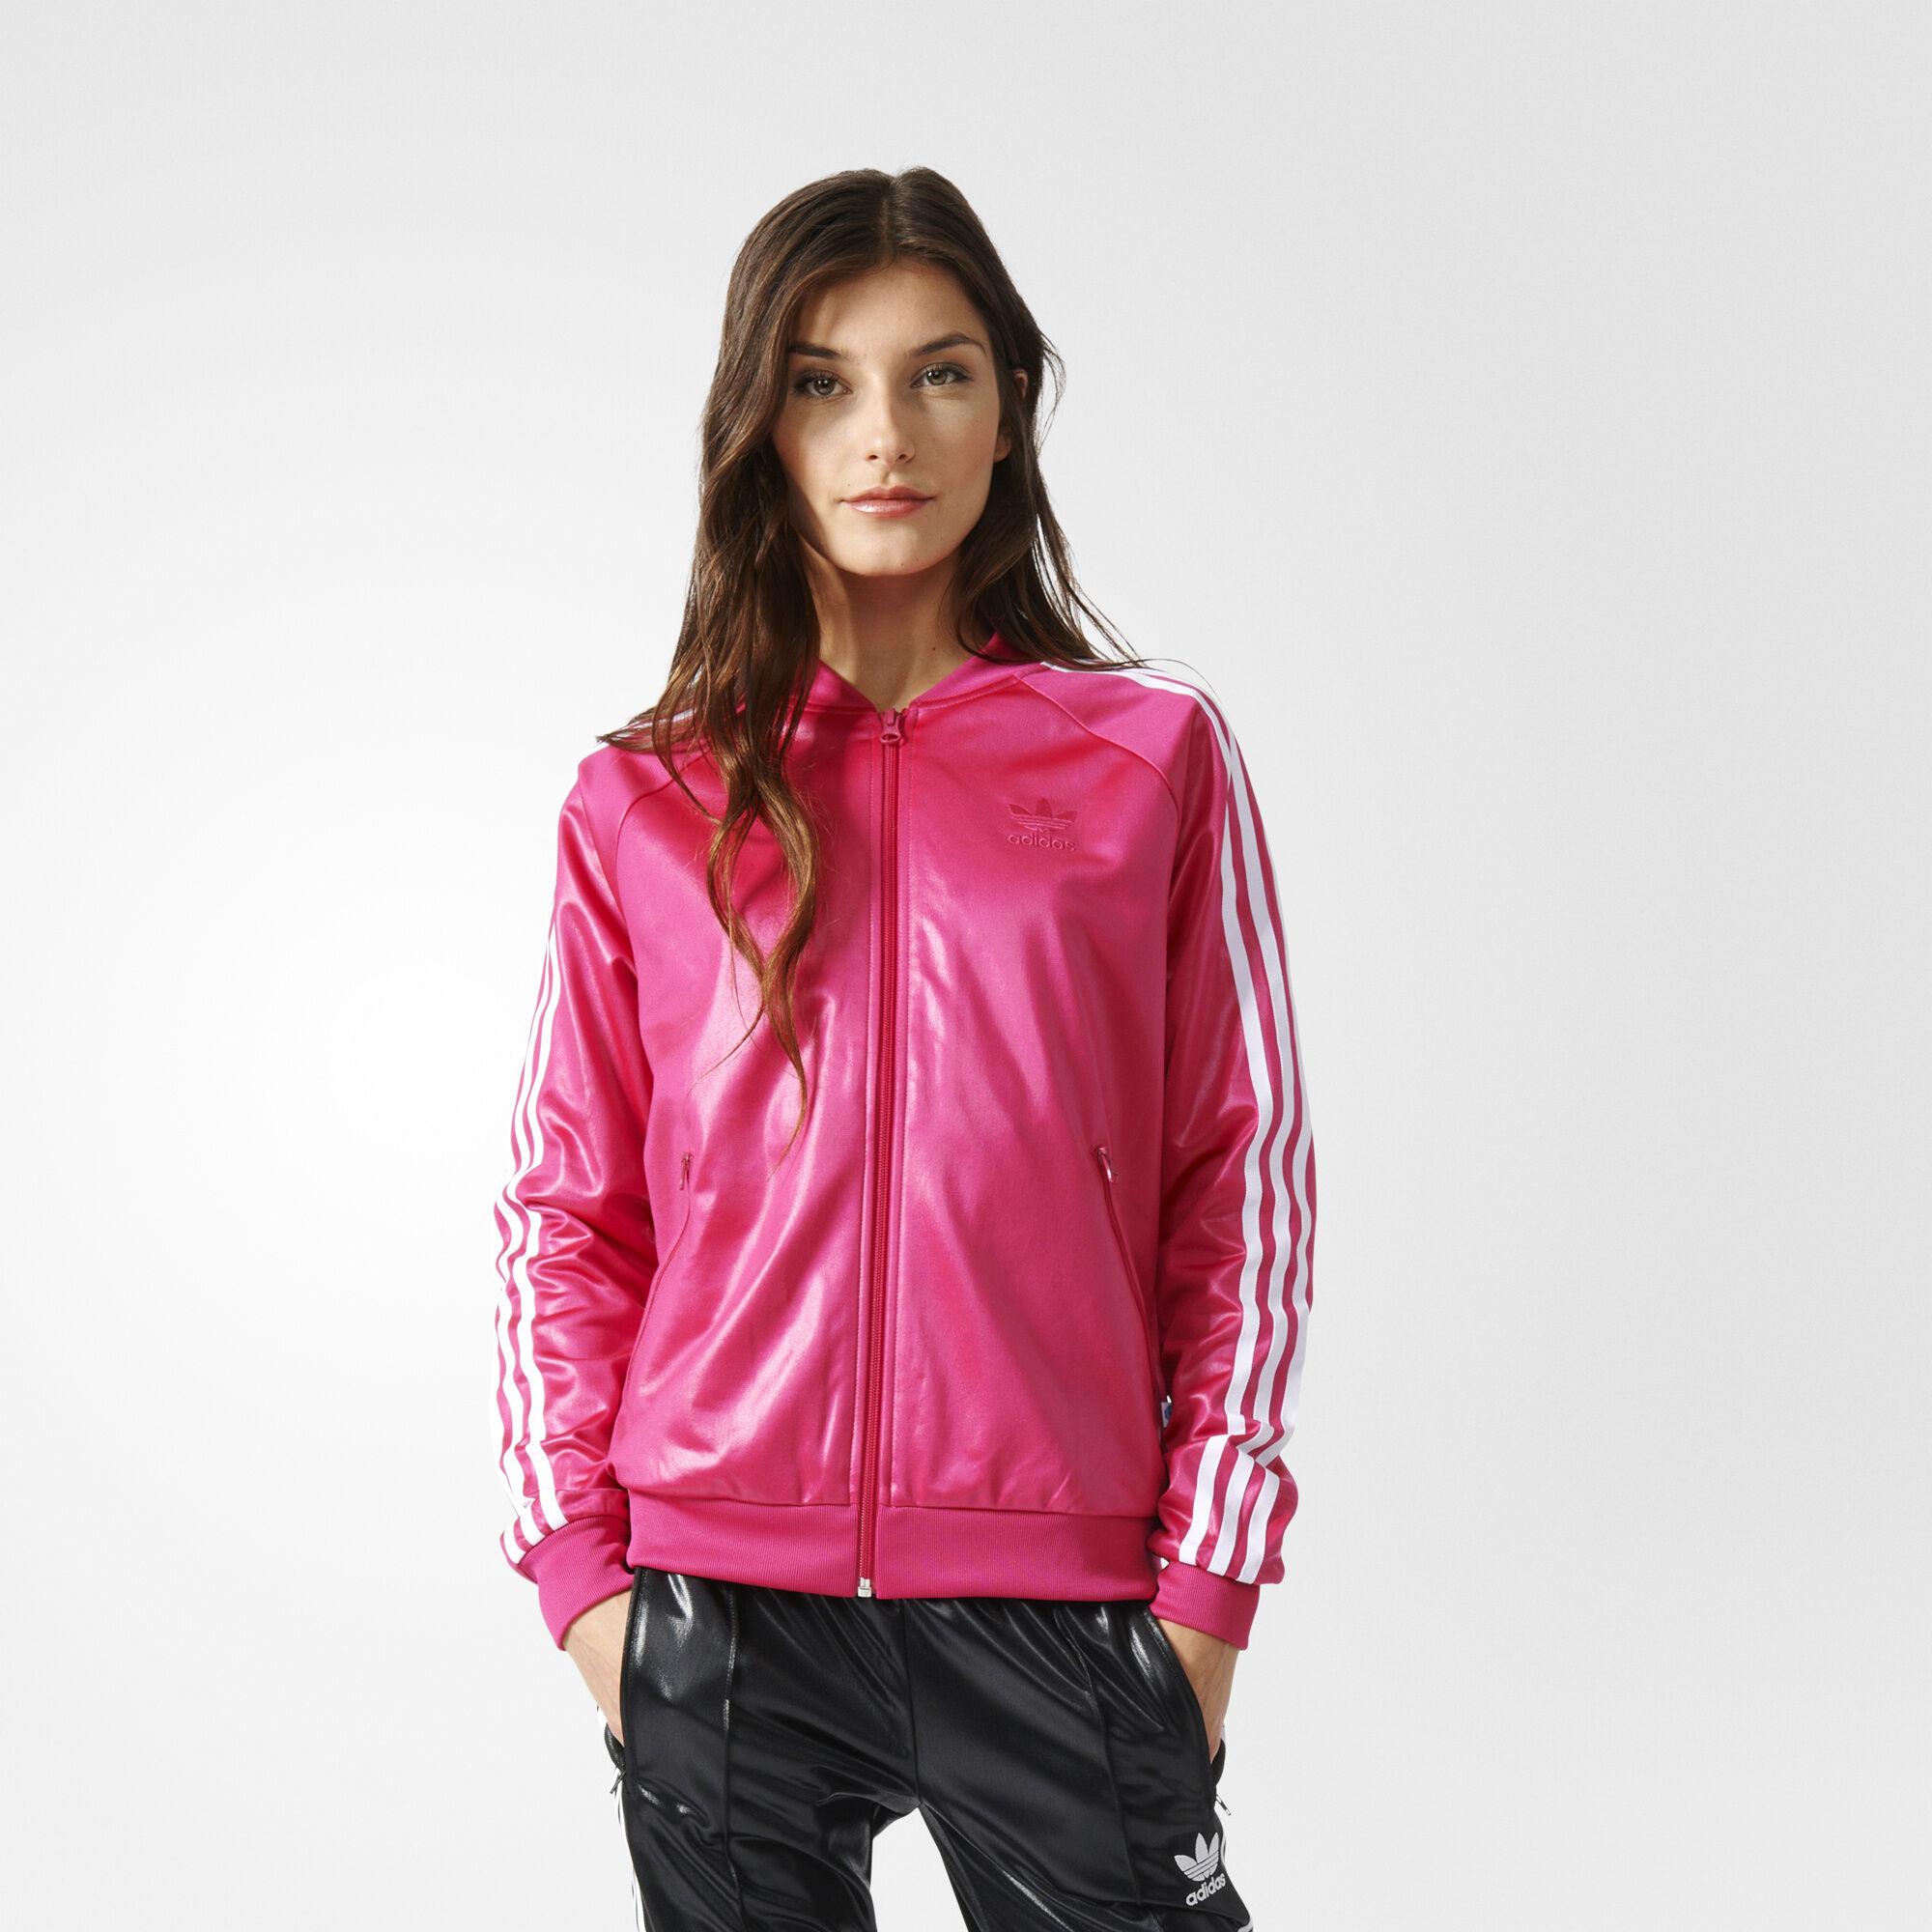 adidas store website